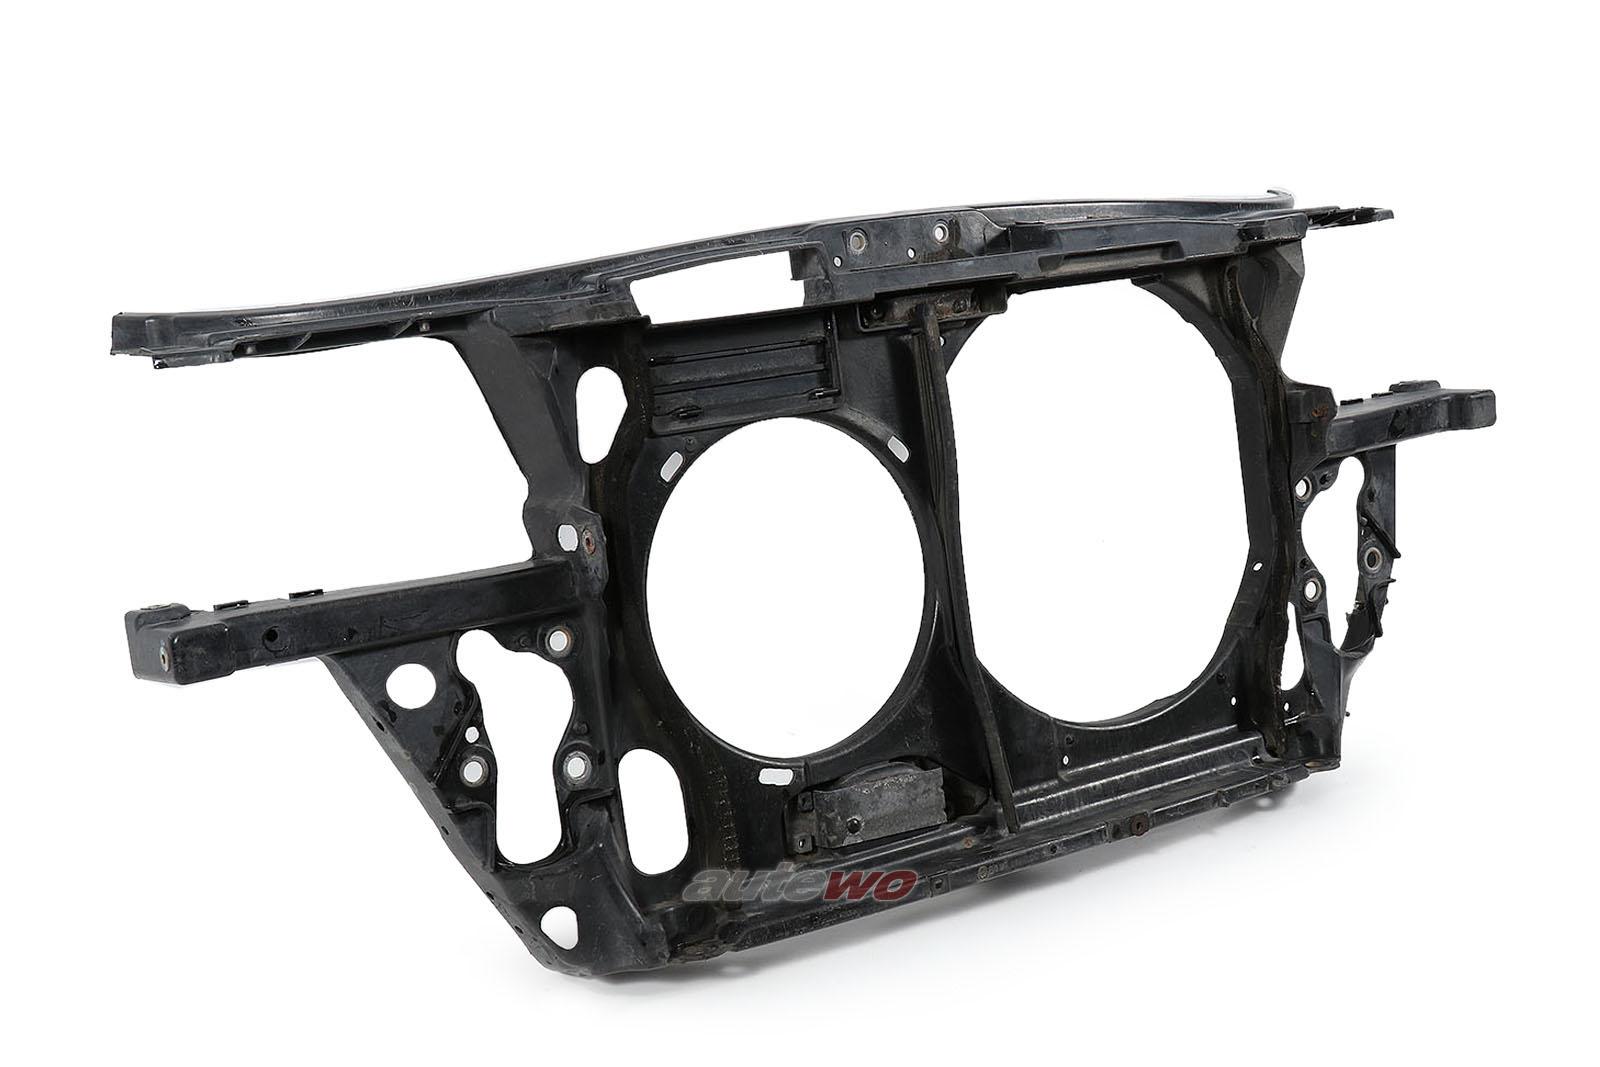 4B0805588K Audi A6 4B 2.5l TDI/2.7l Benzin 6 Zylinder Frontmaske/Schlossträger